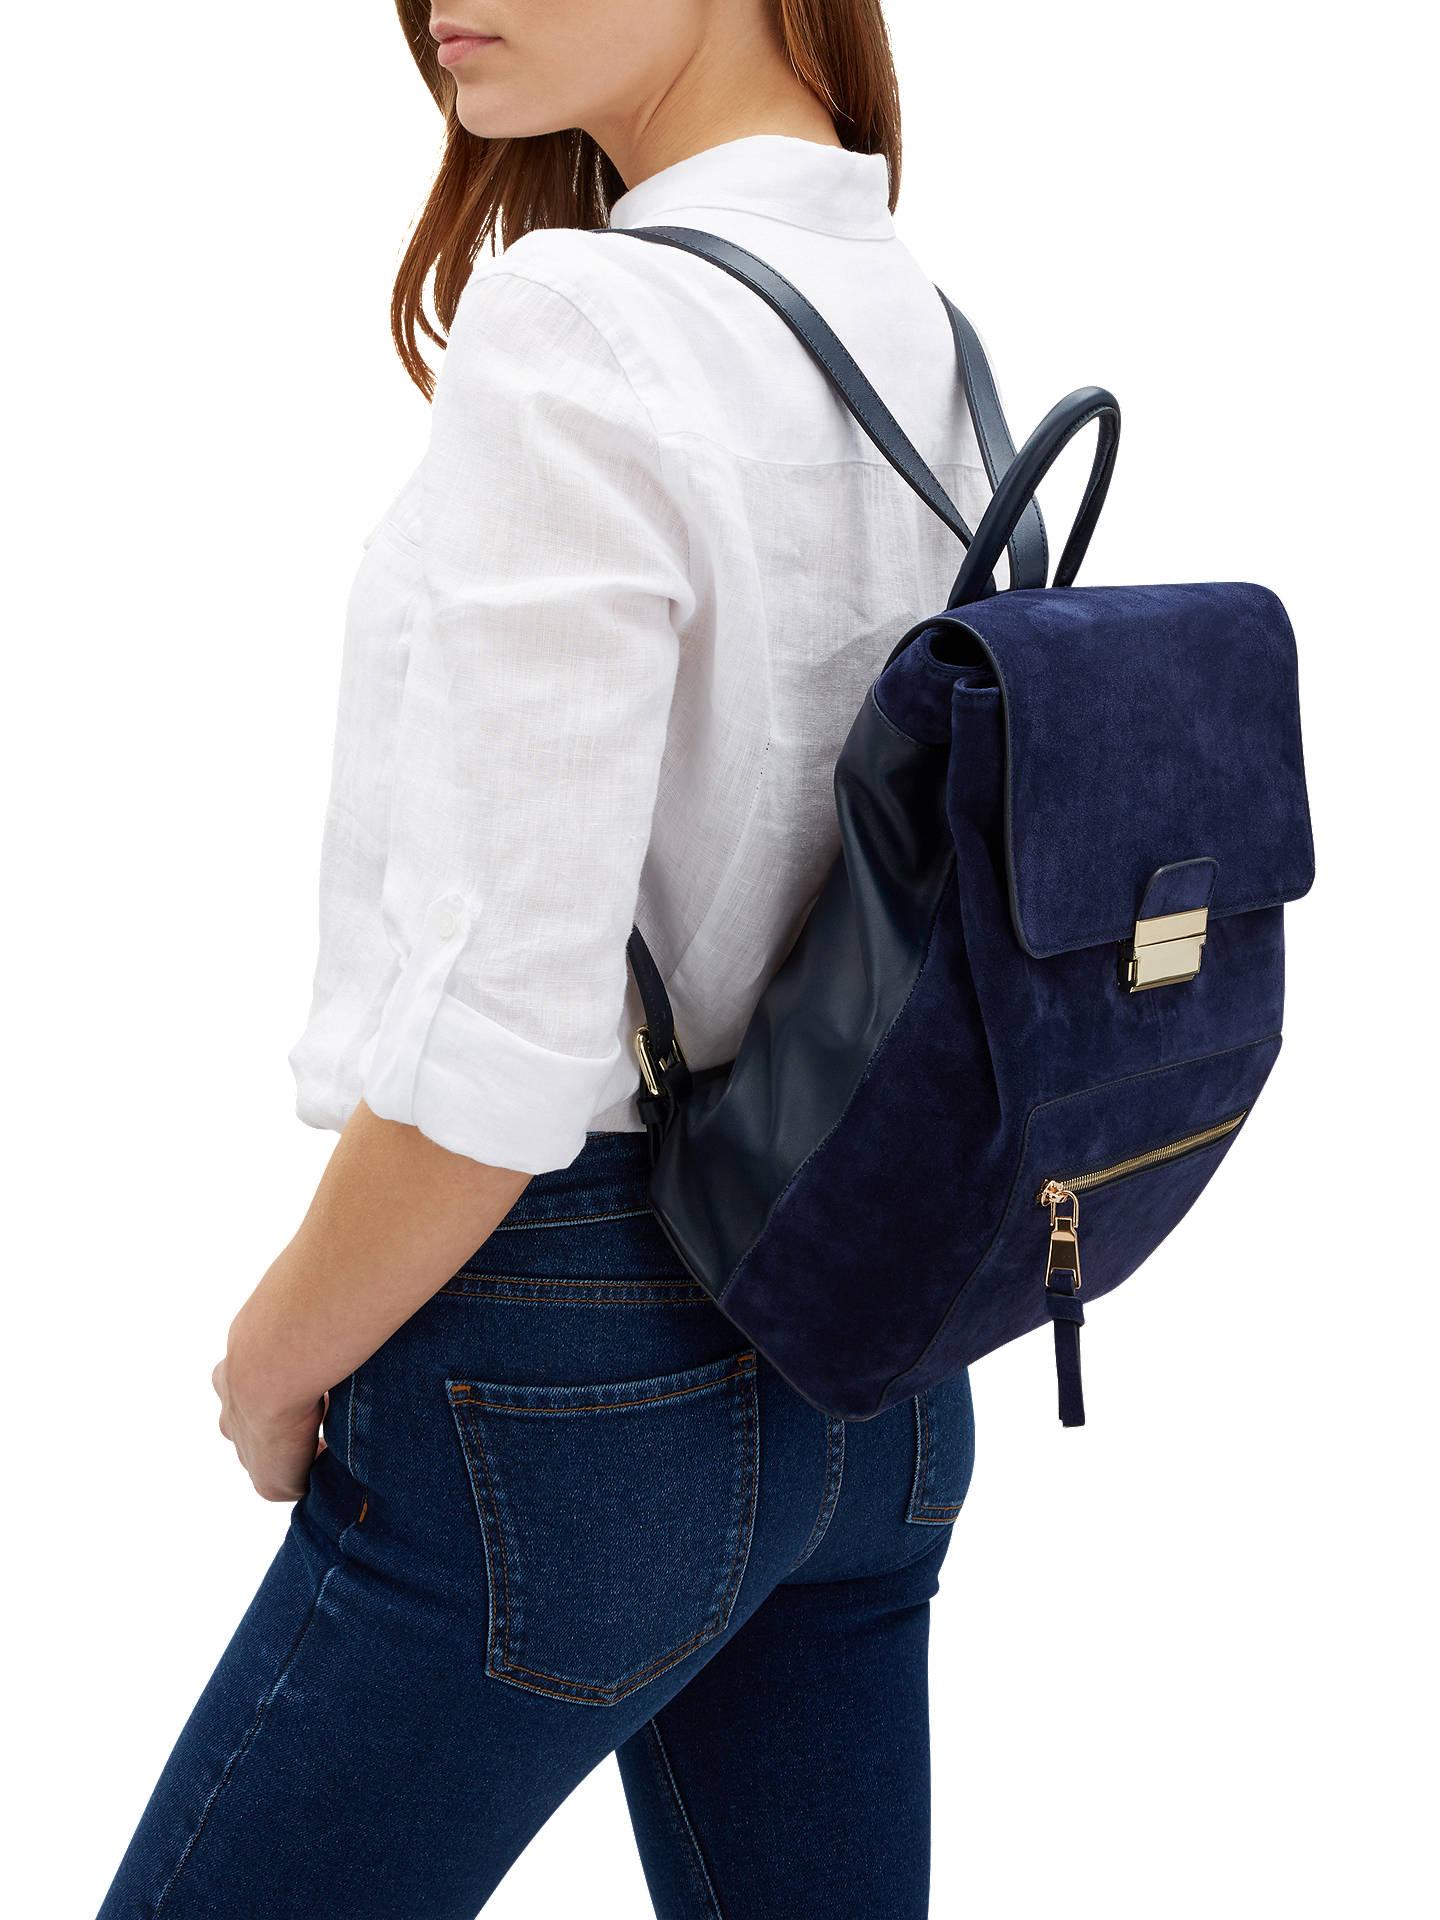 Jaeger Gracie Suede Backpack, Navy